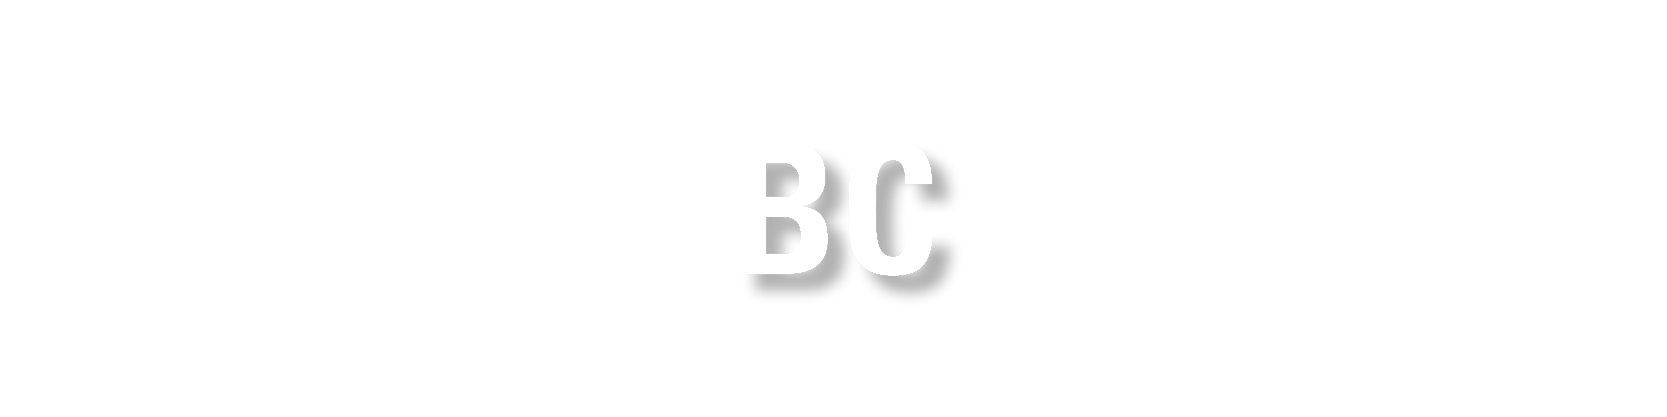 CK - BANNERS SITE - DESKTOP - TITULO - BC